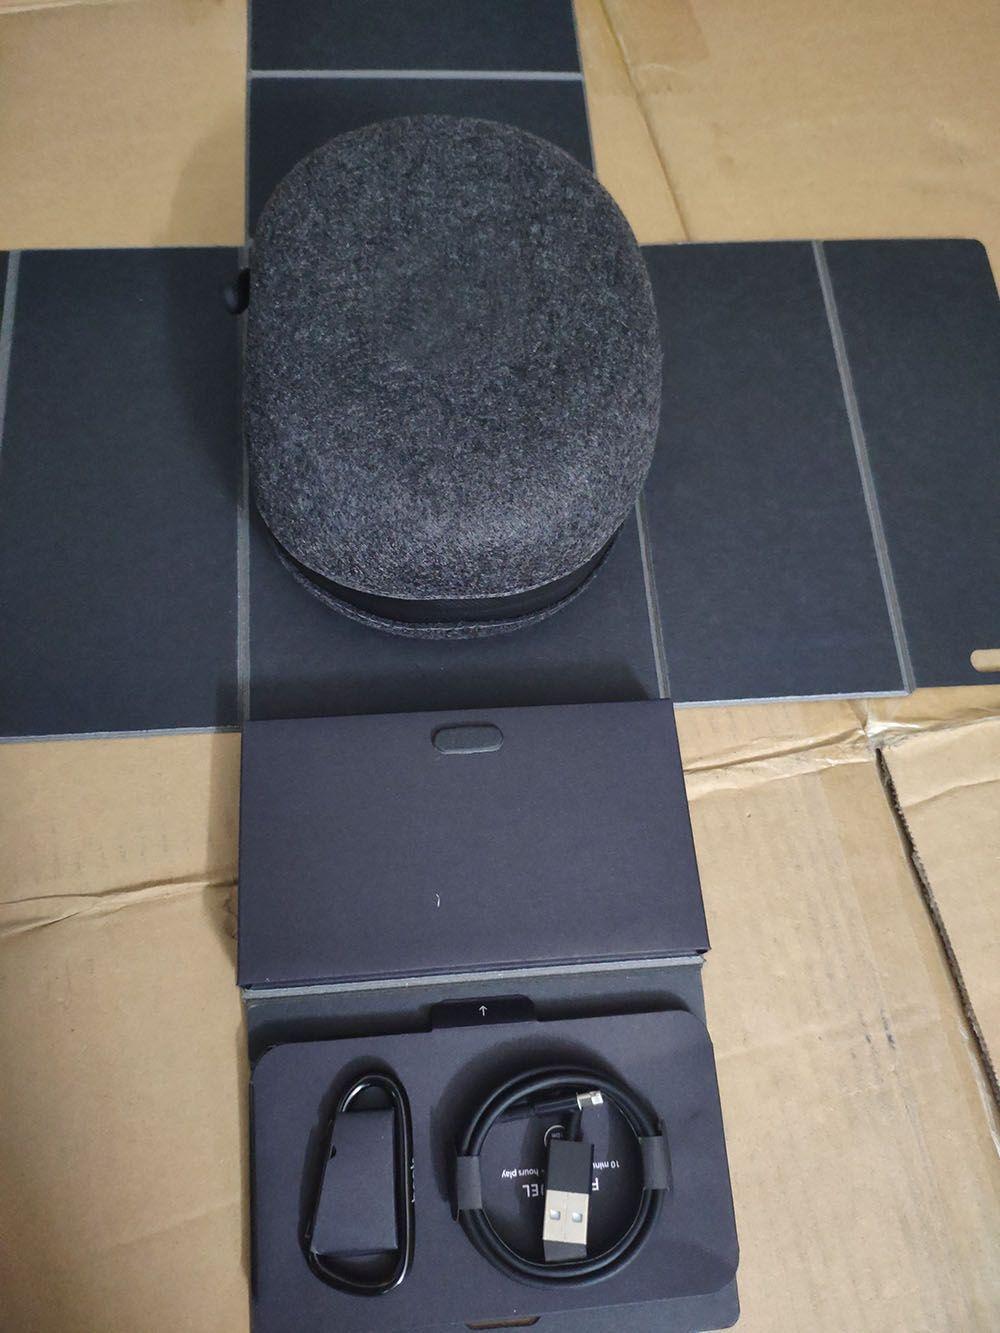 2021 Rumore del truciolo Annullare ANC On Ear Bluetooth senza fili Cuffie Pop Windows Pro Cuffie Deep Bass